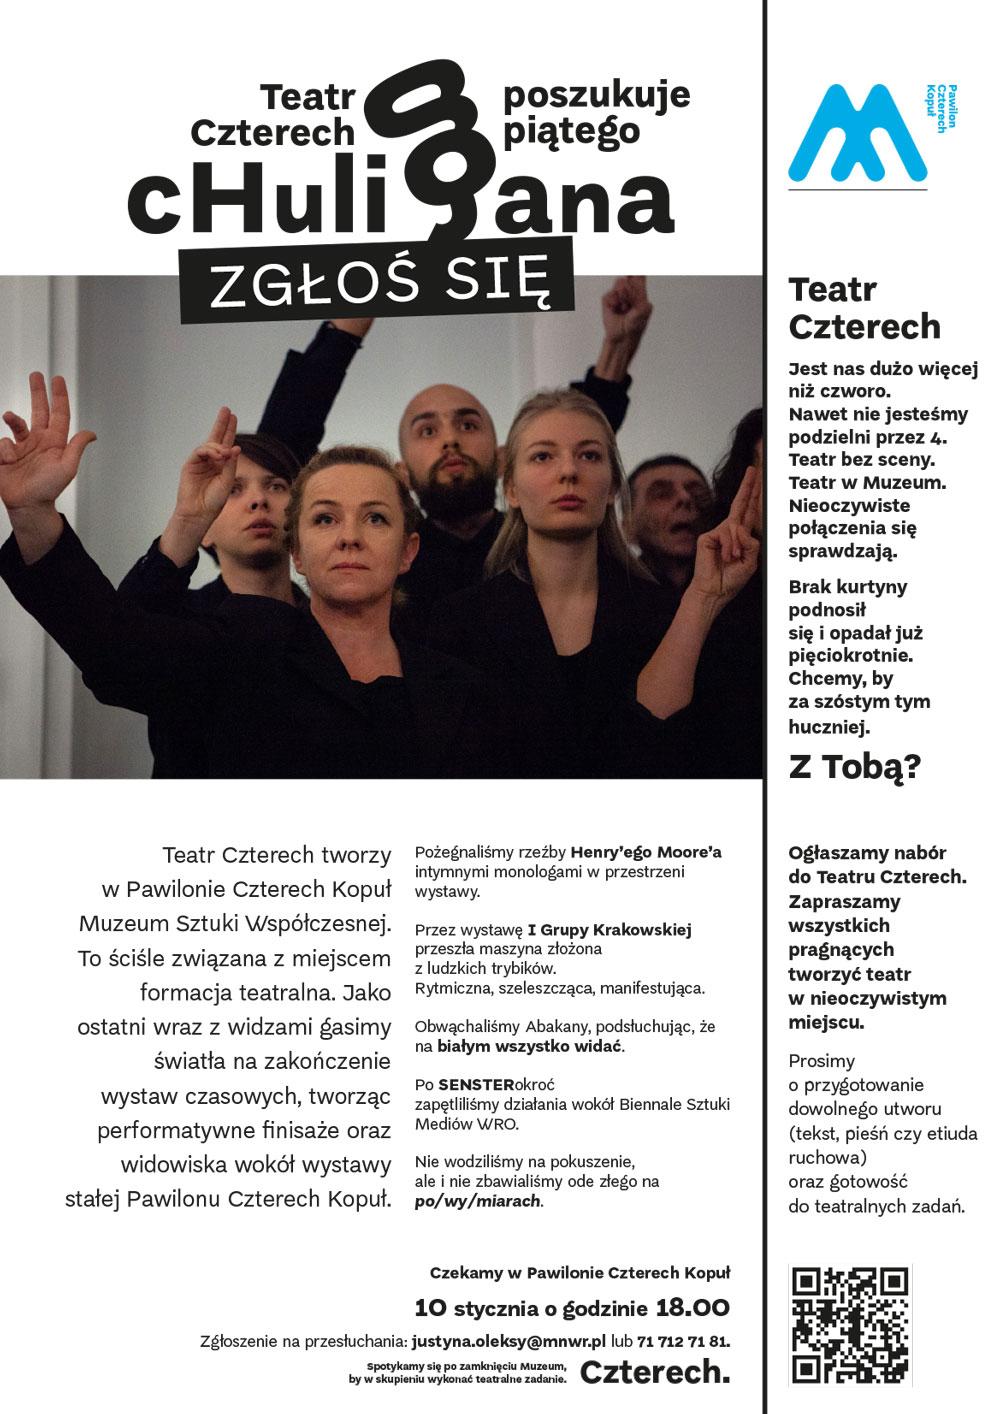 plakat ogłaszający nabór doTeatru Czterech